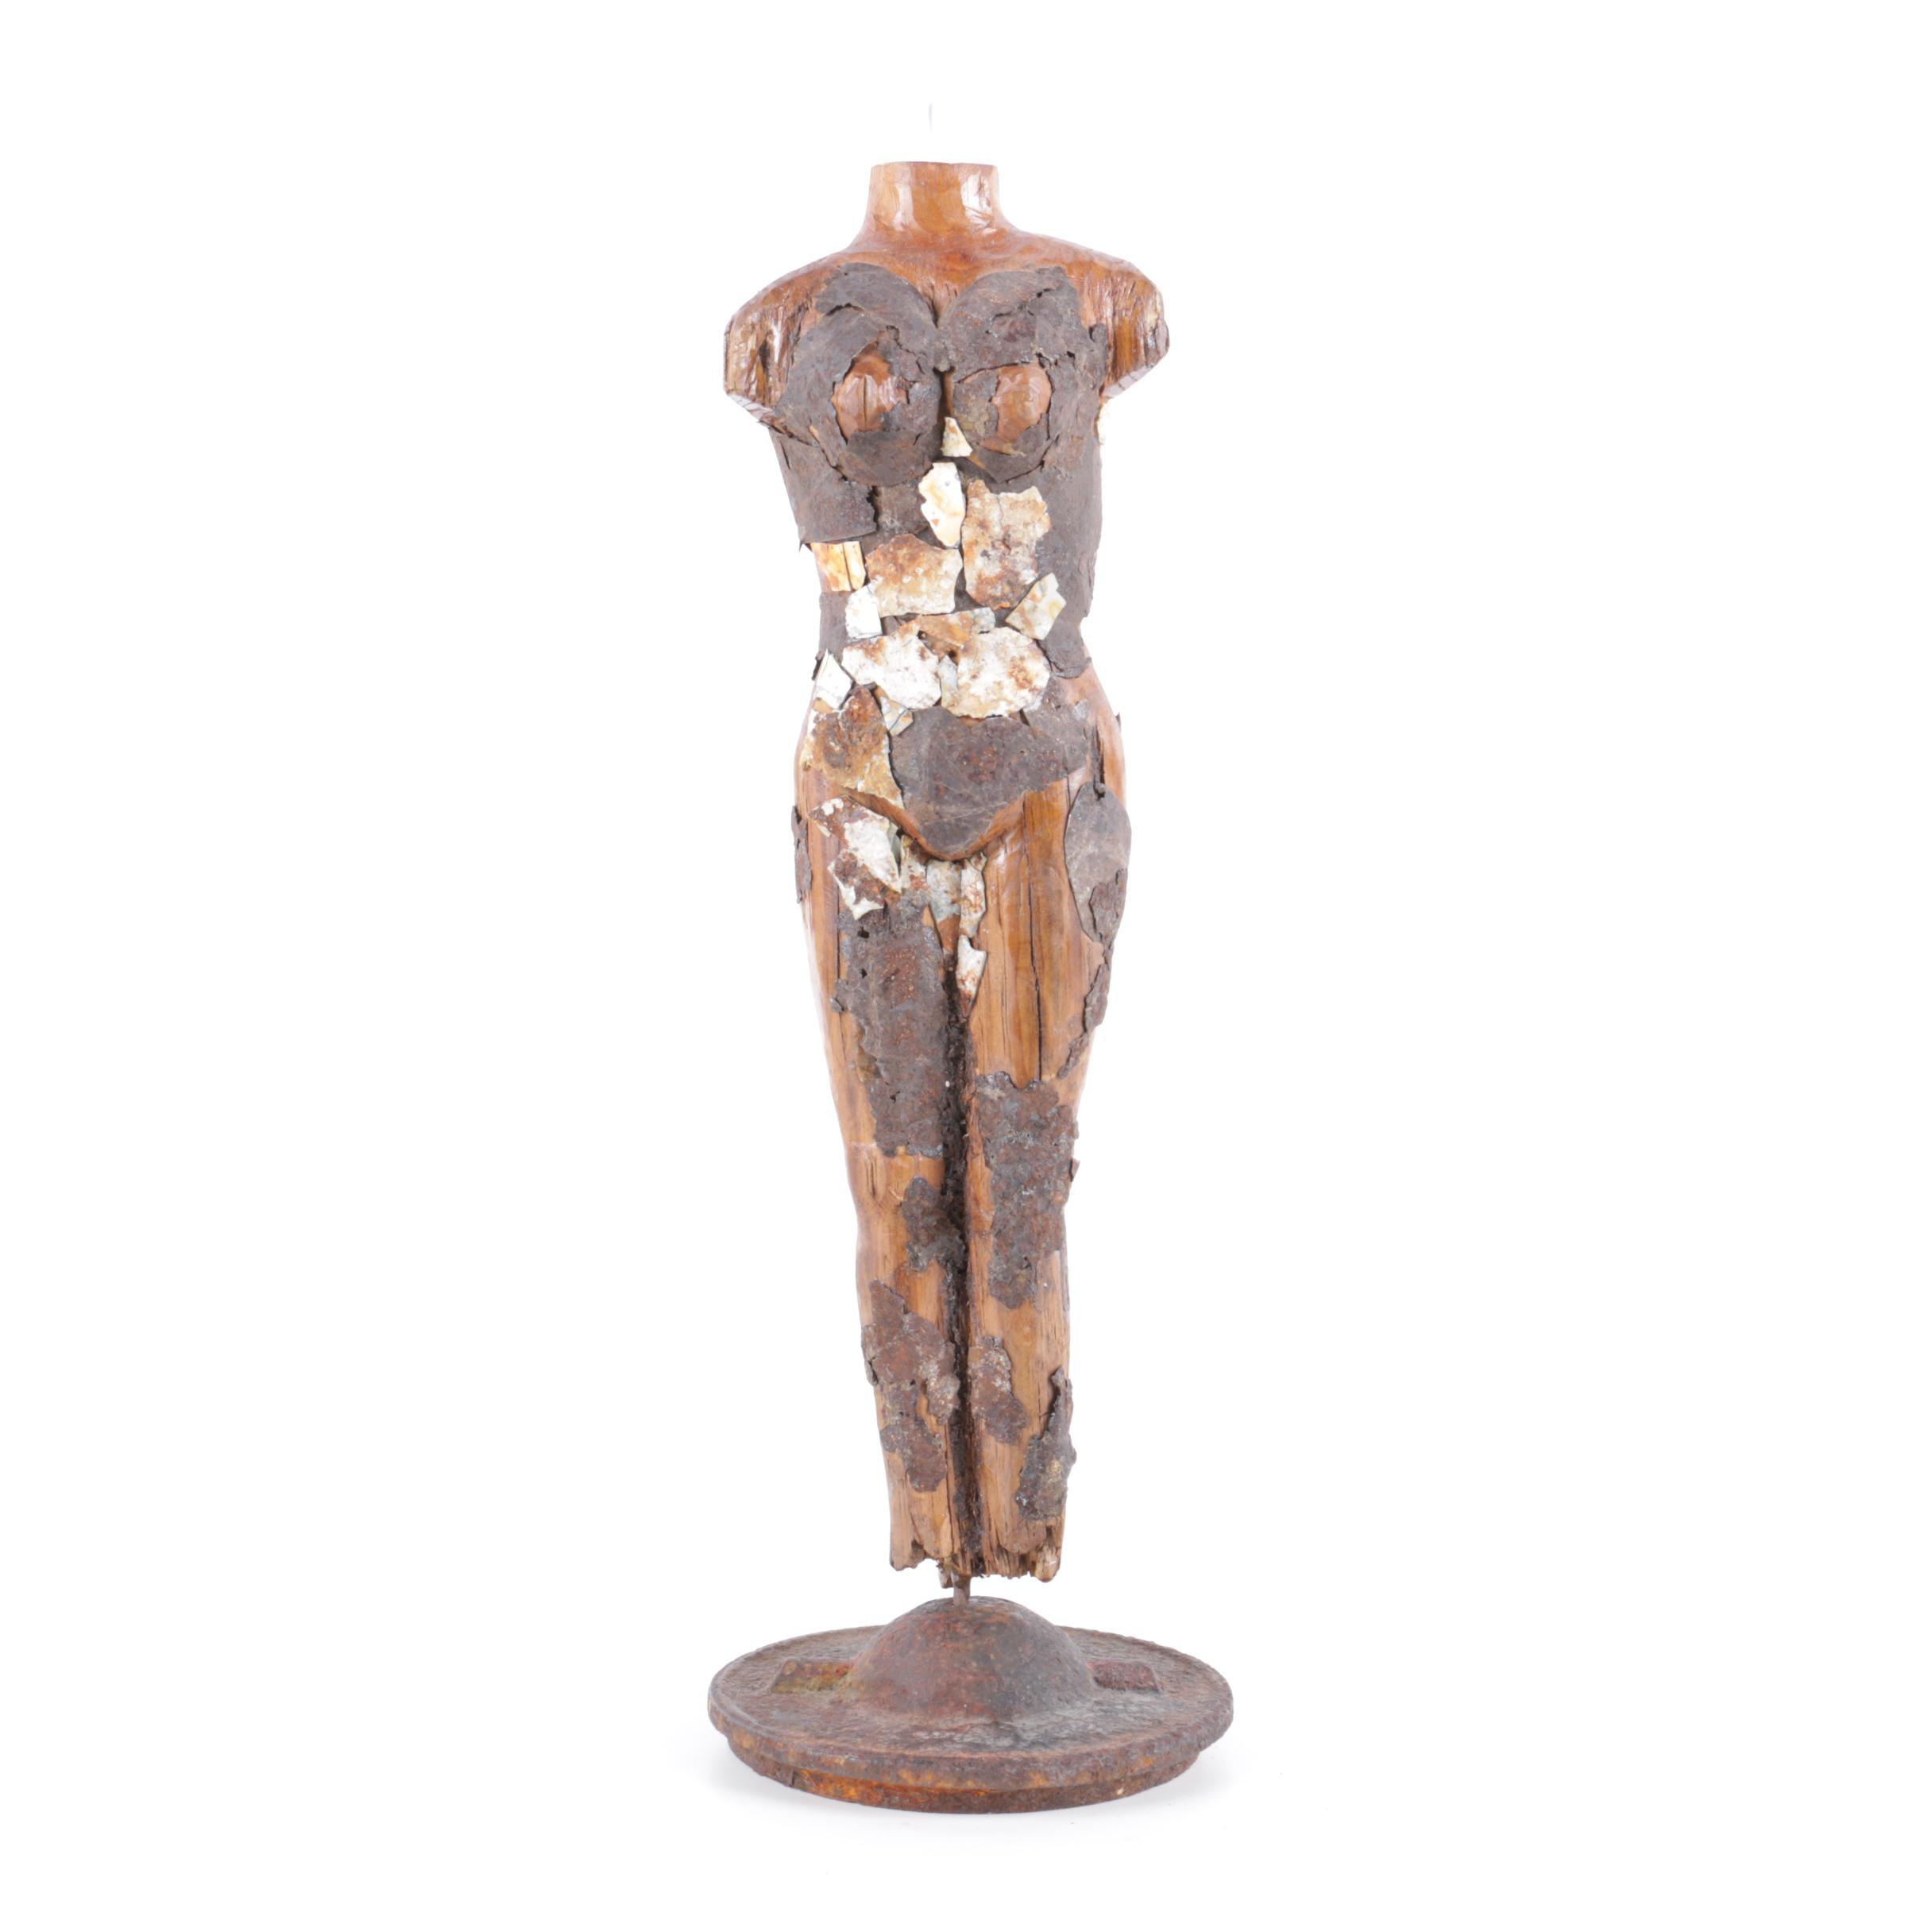 Duke Rood Wood and Metal Sculpture of Female Figure